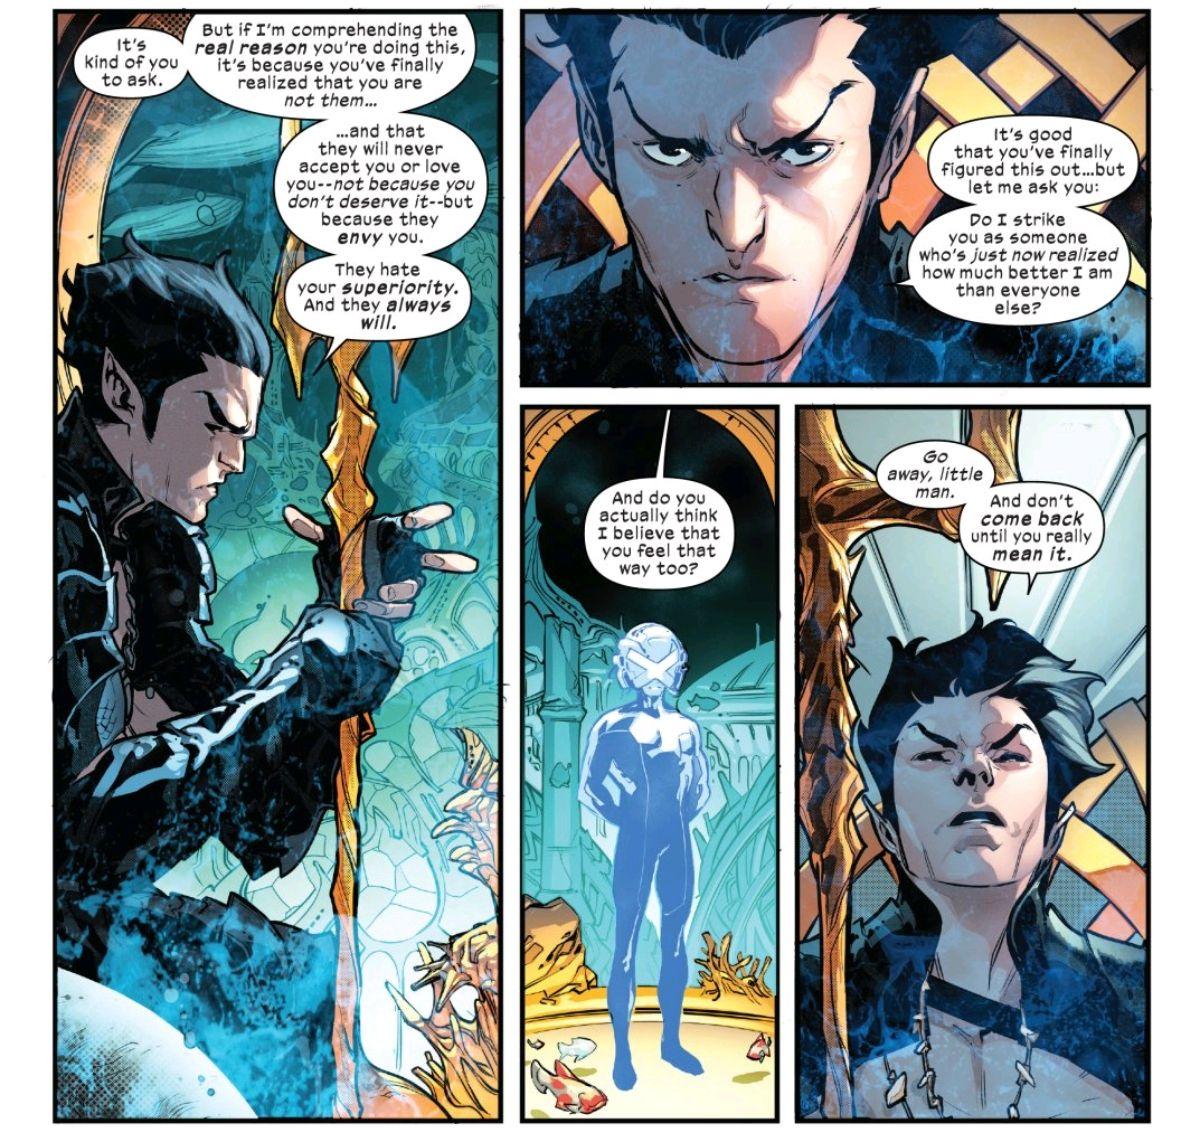 Namor the Sub-Mariner, king of Atlantis, rejects Professor X's invitation to Krakoa, in Powers of X #5, Marvel Comics (2019).